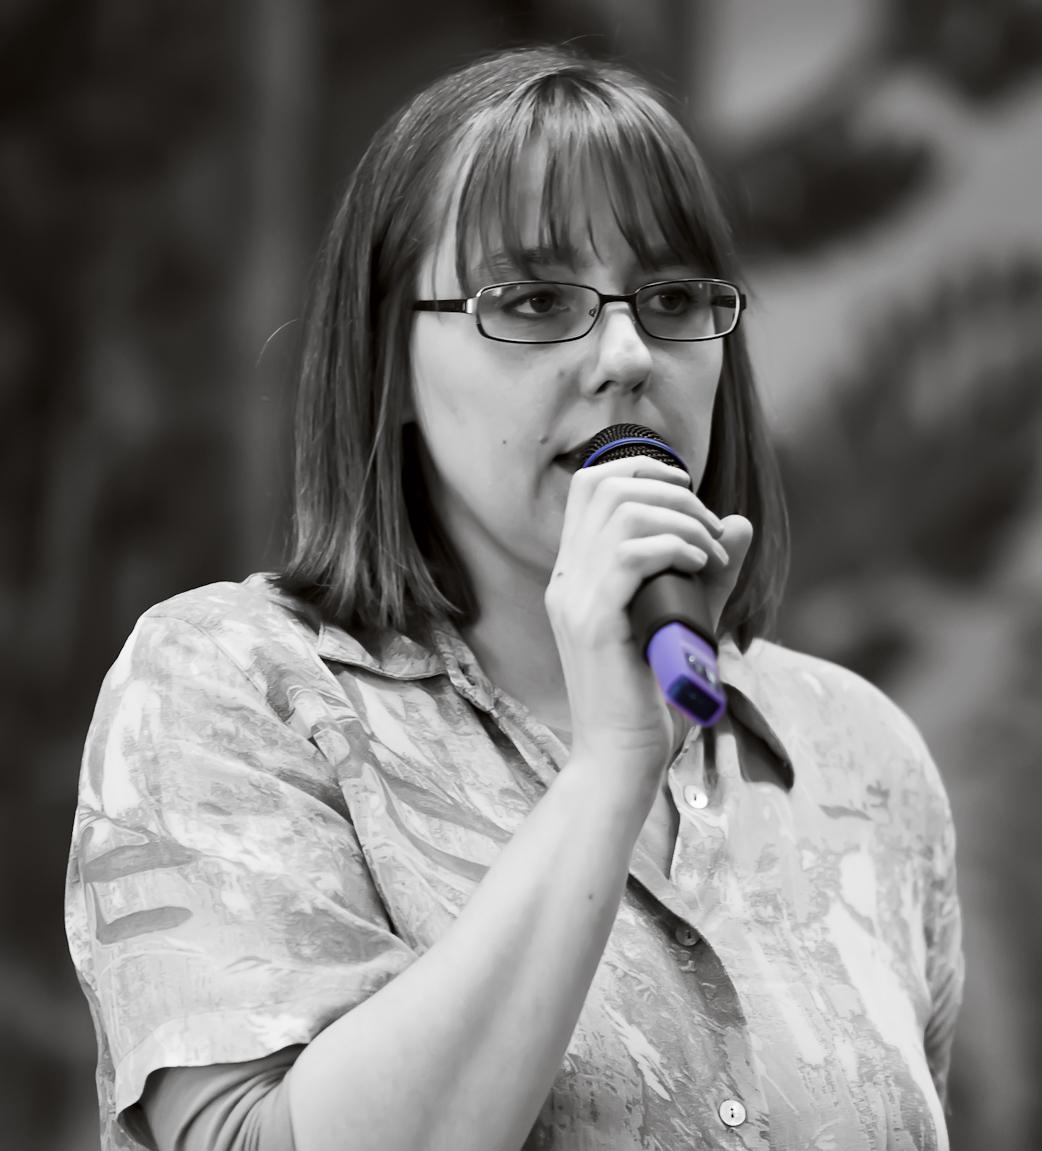 the presenter, photo 159012, 2010-09-26